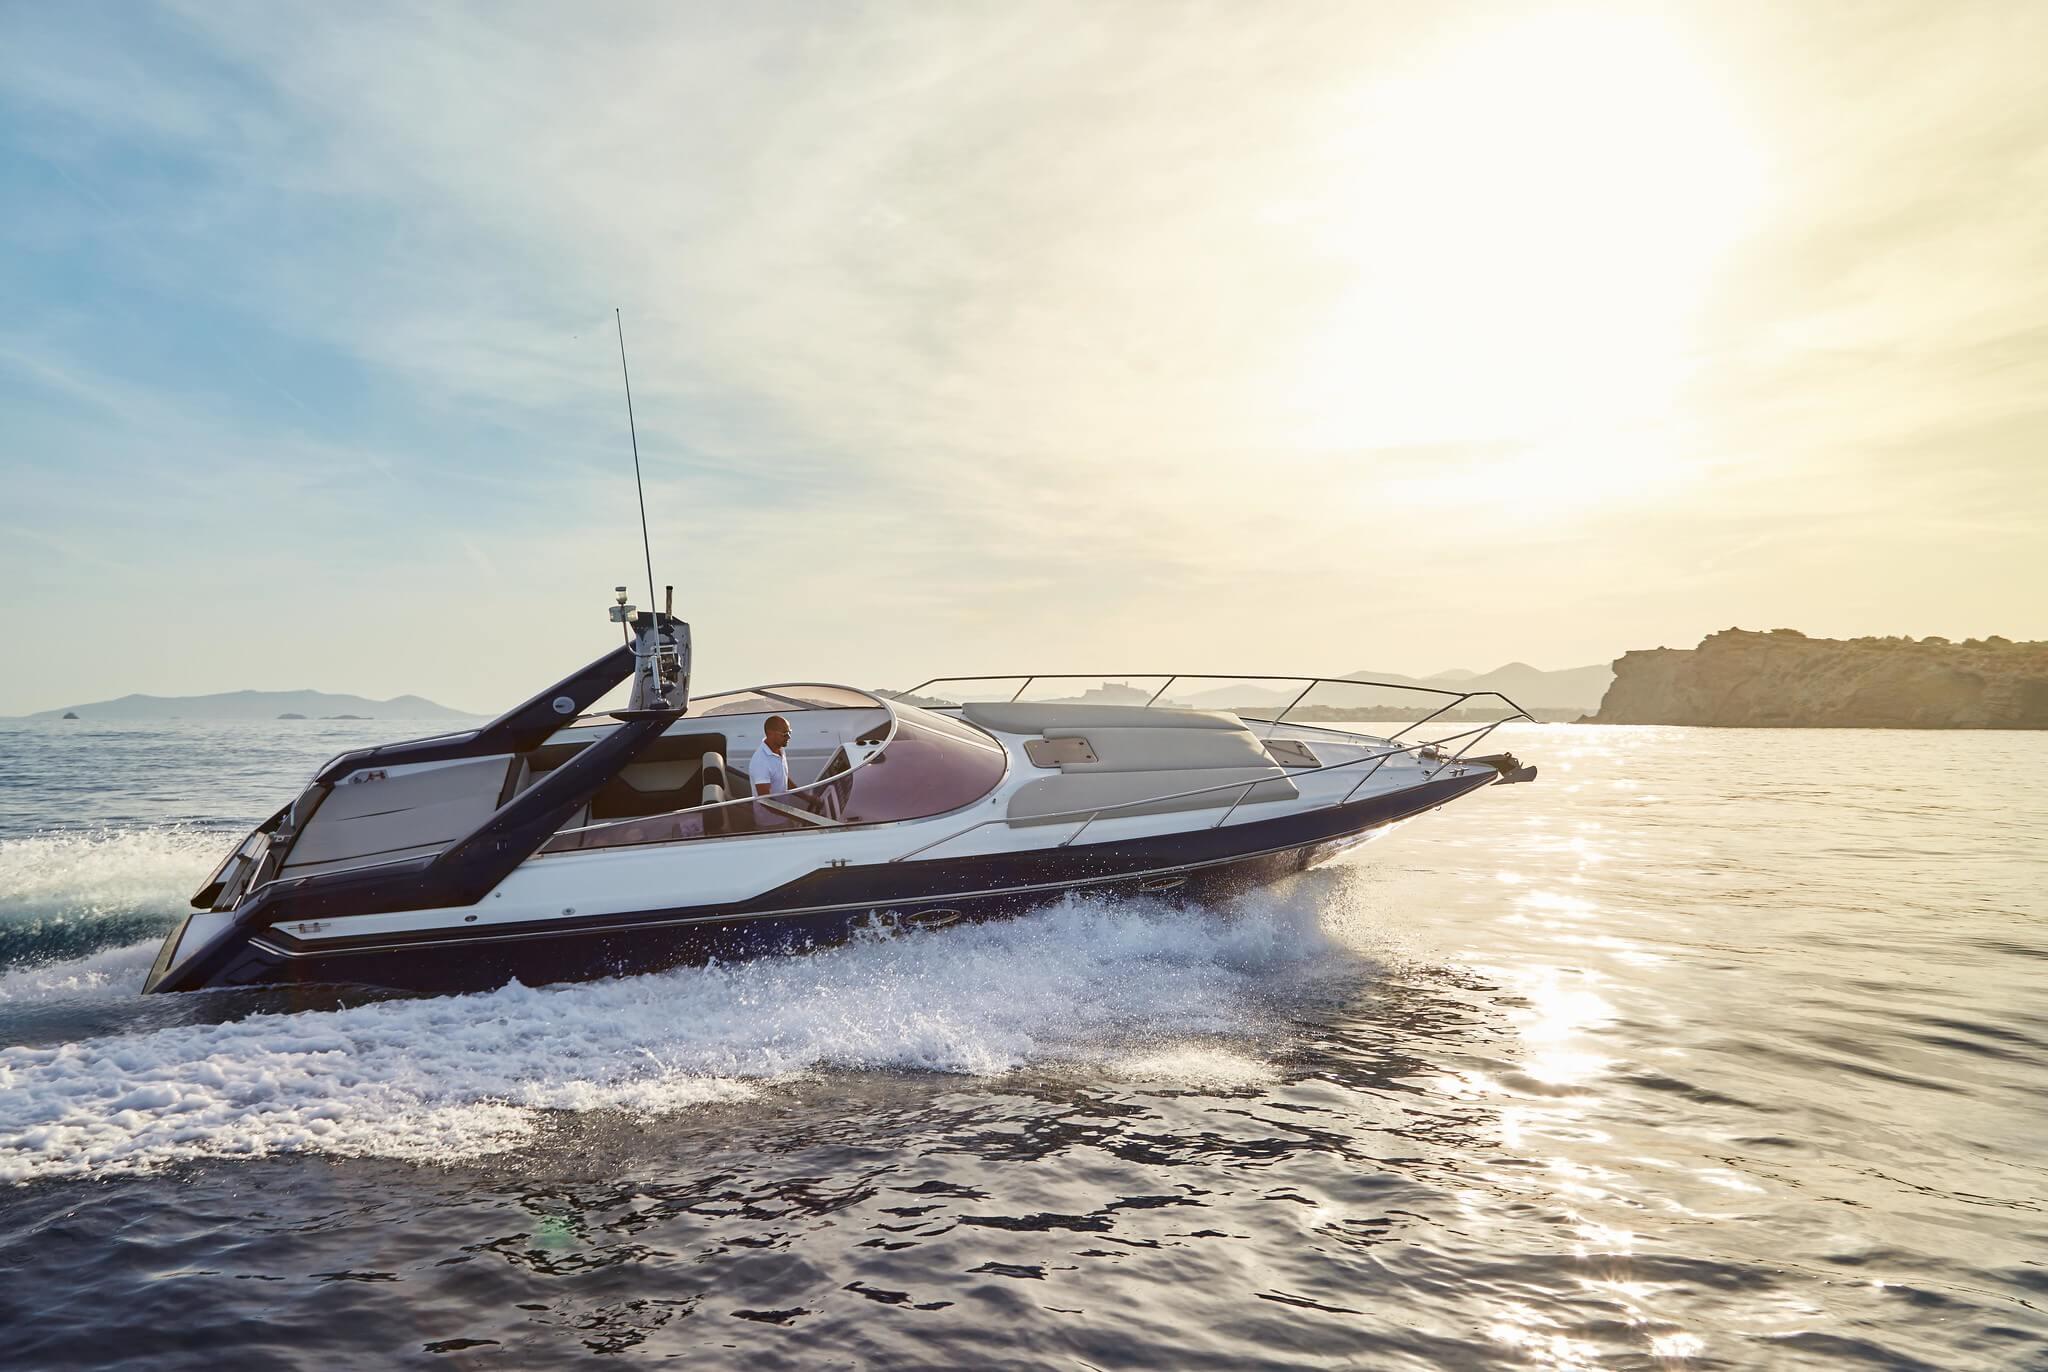 https://www.white-ibiza.com/wp-content/uploads/2020/04/inspire-boats.jpg